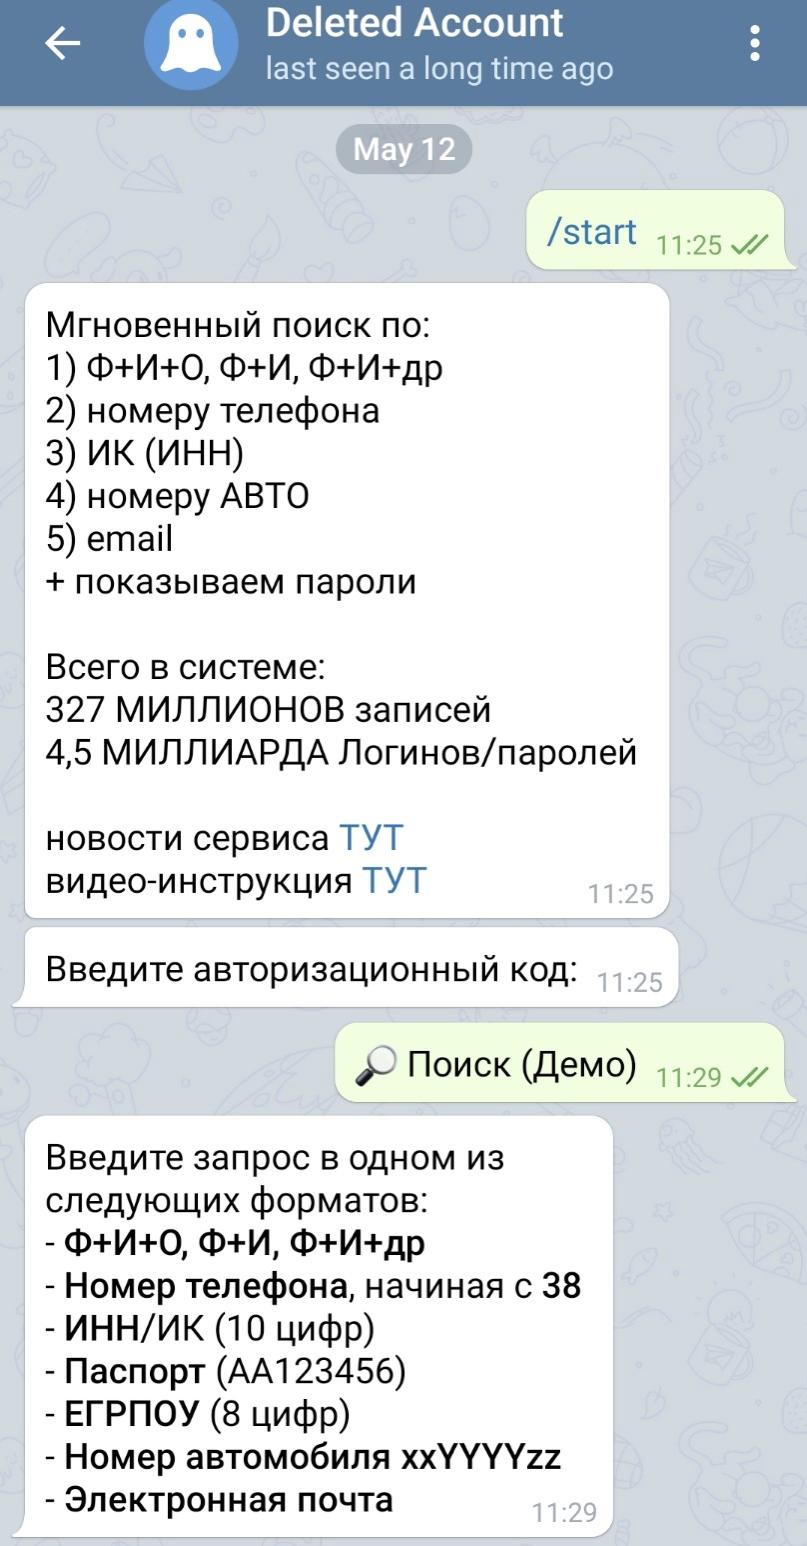 ukraine-overview-image-2